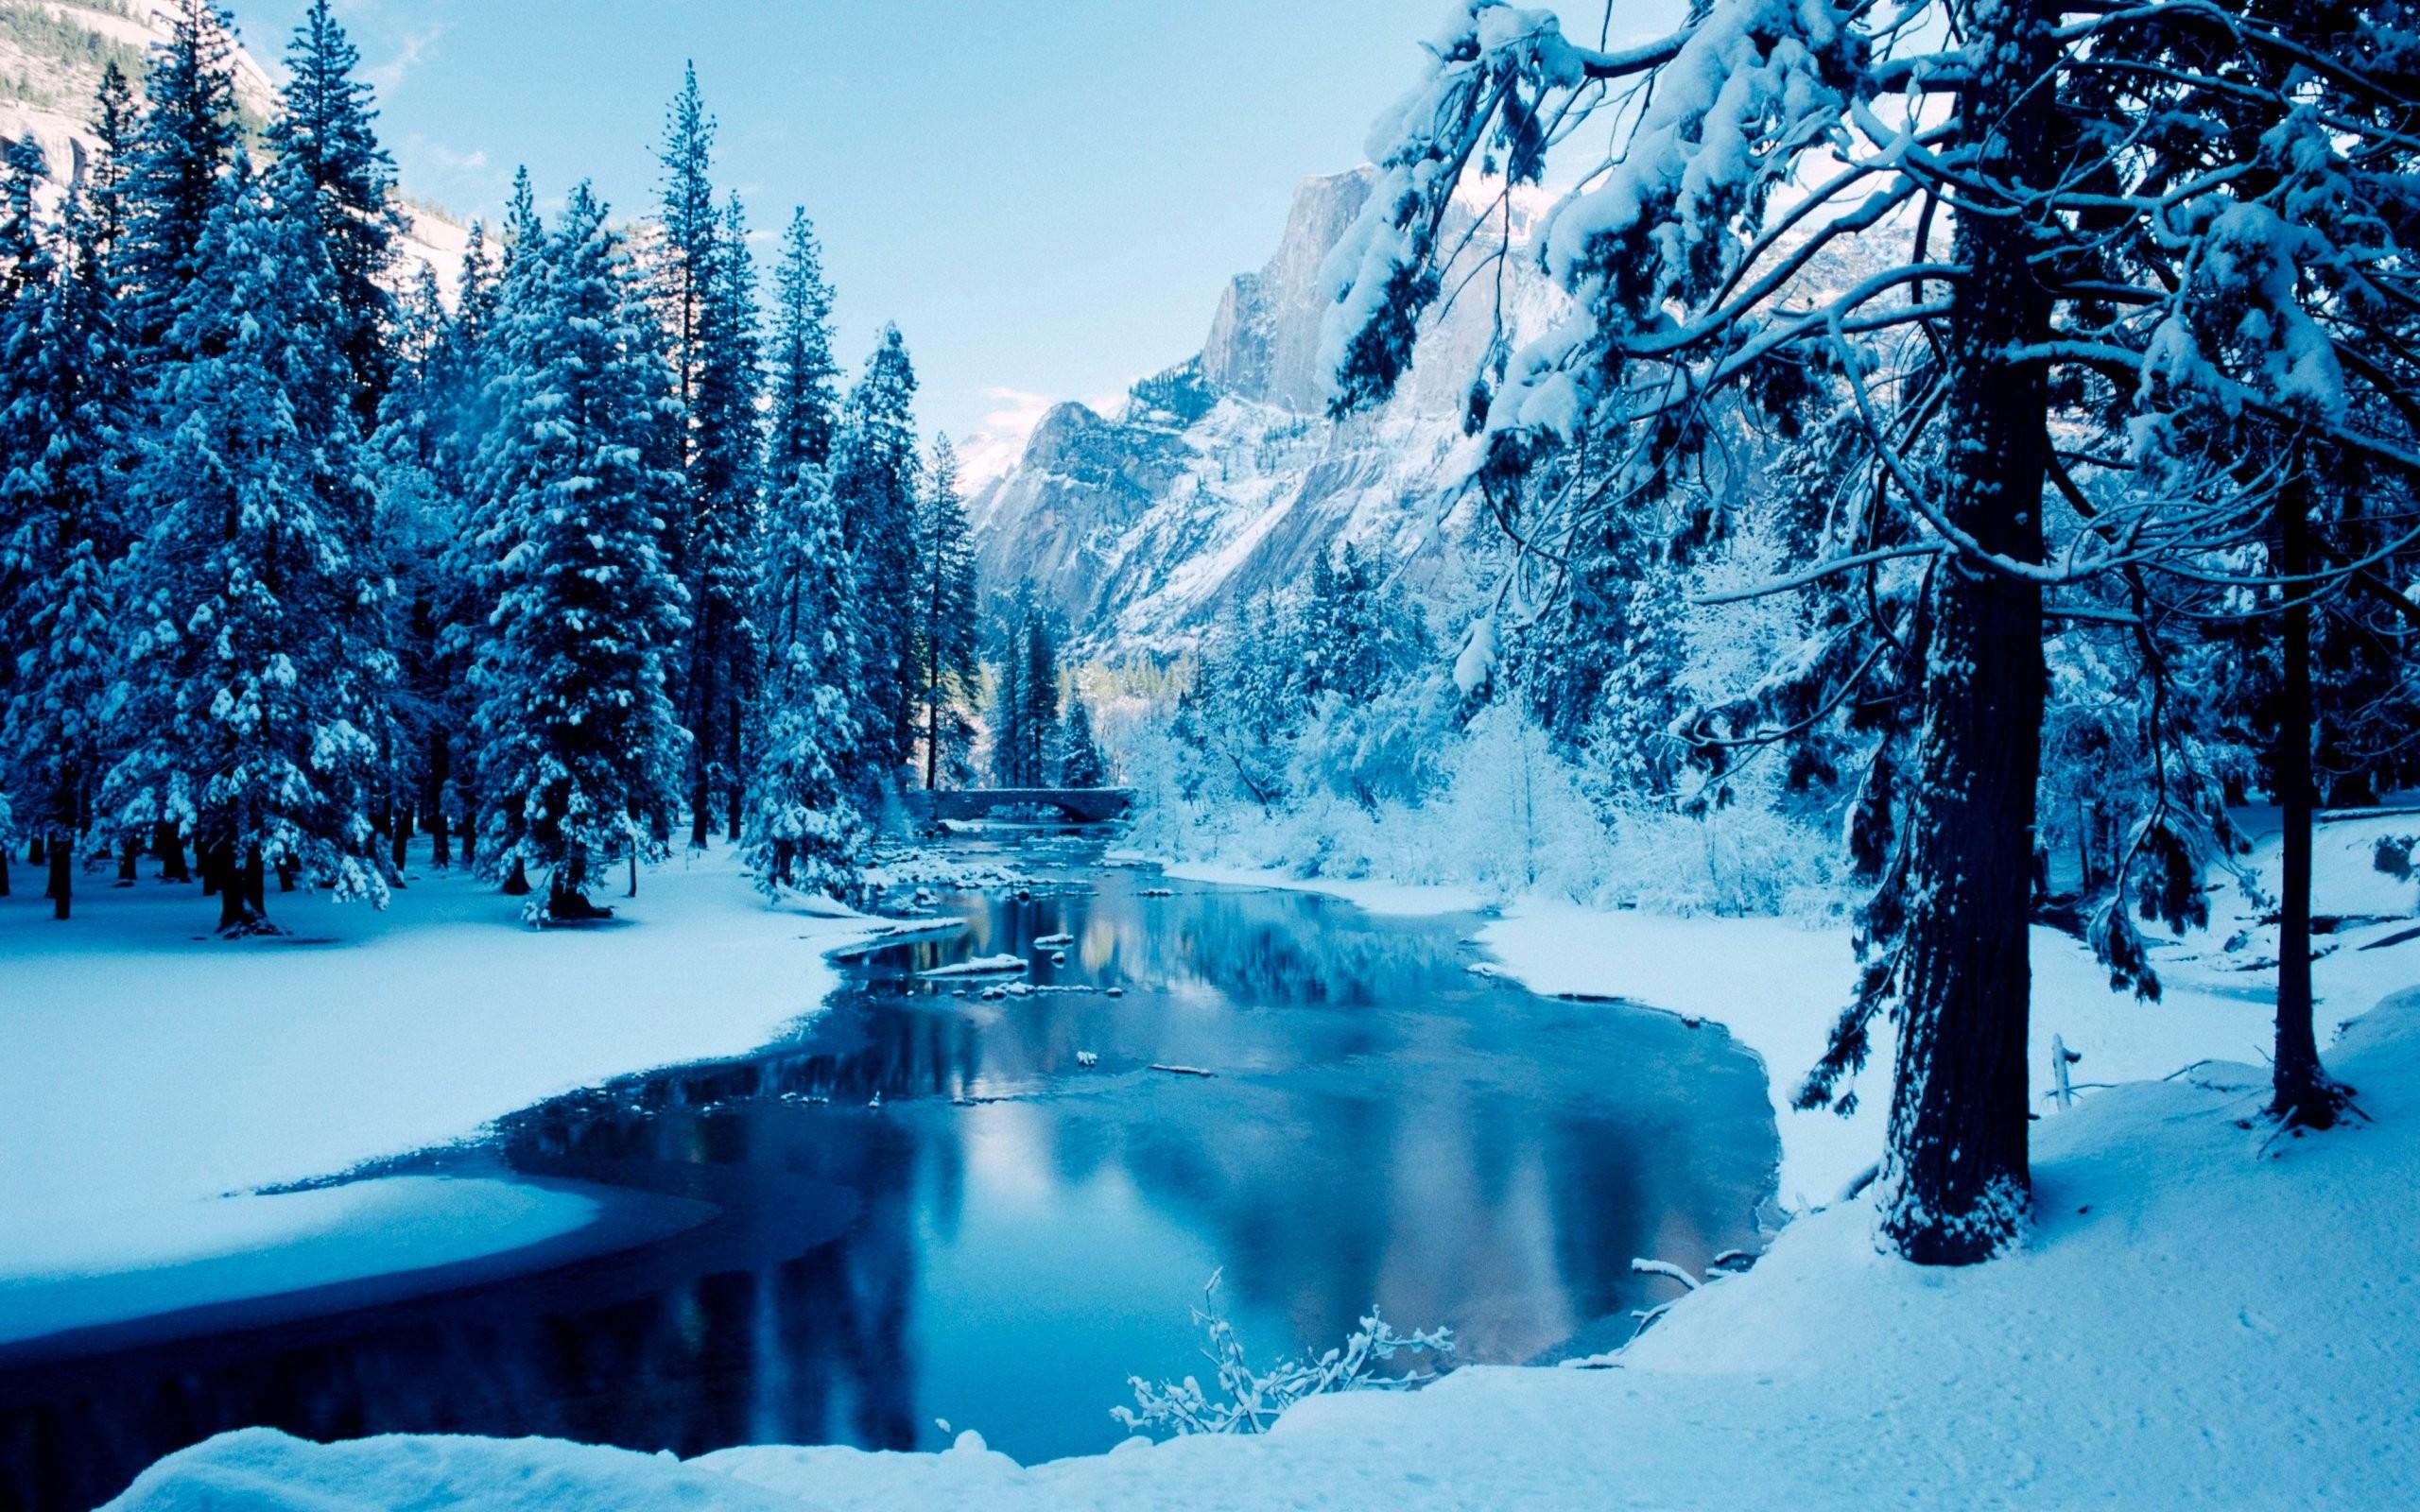 Winter Snow Scenes Wallpaper 1